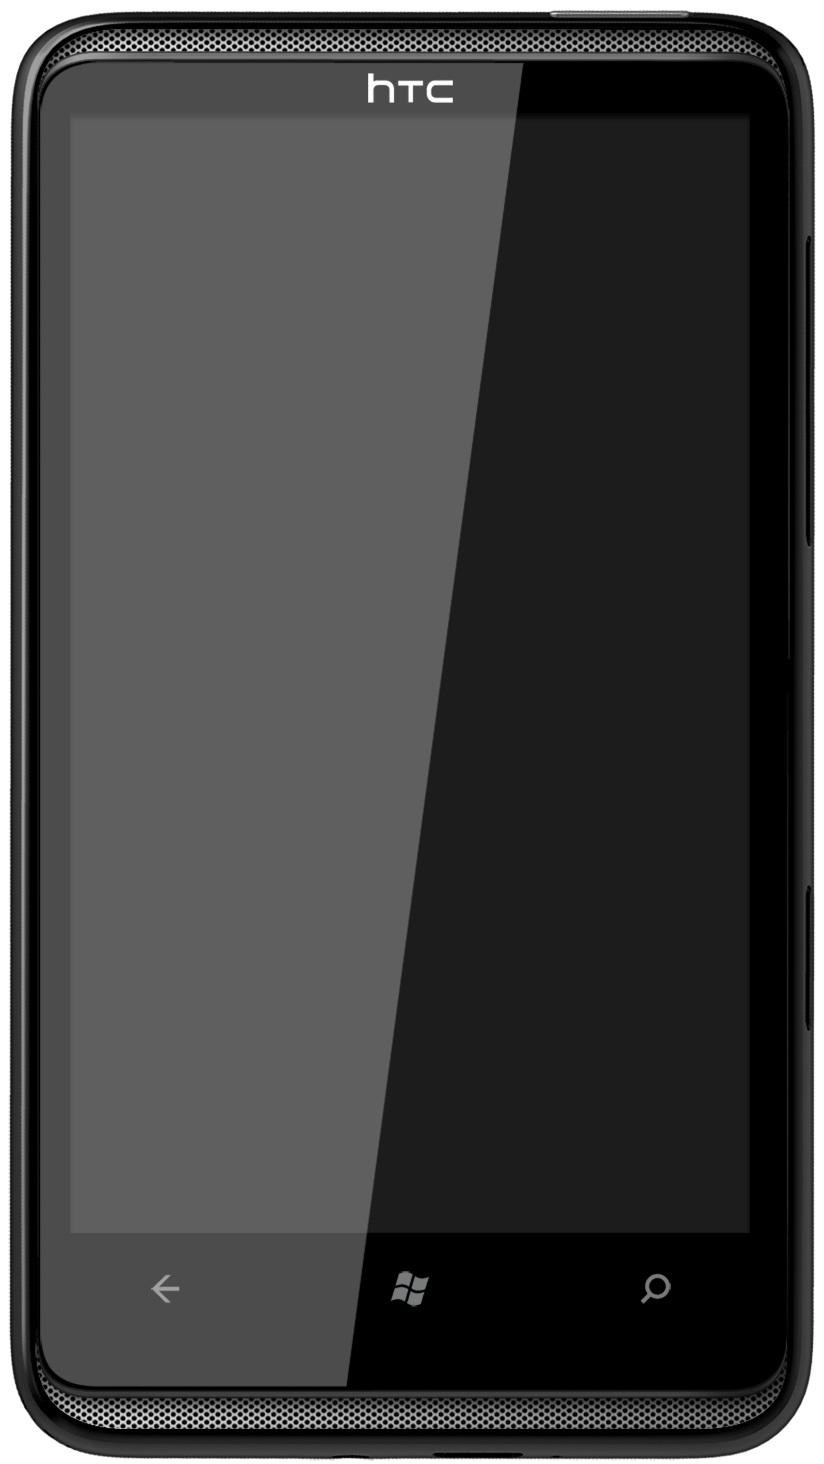 HTC HD7 - Specs